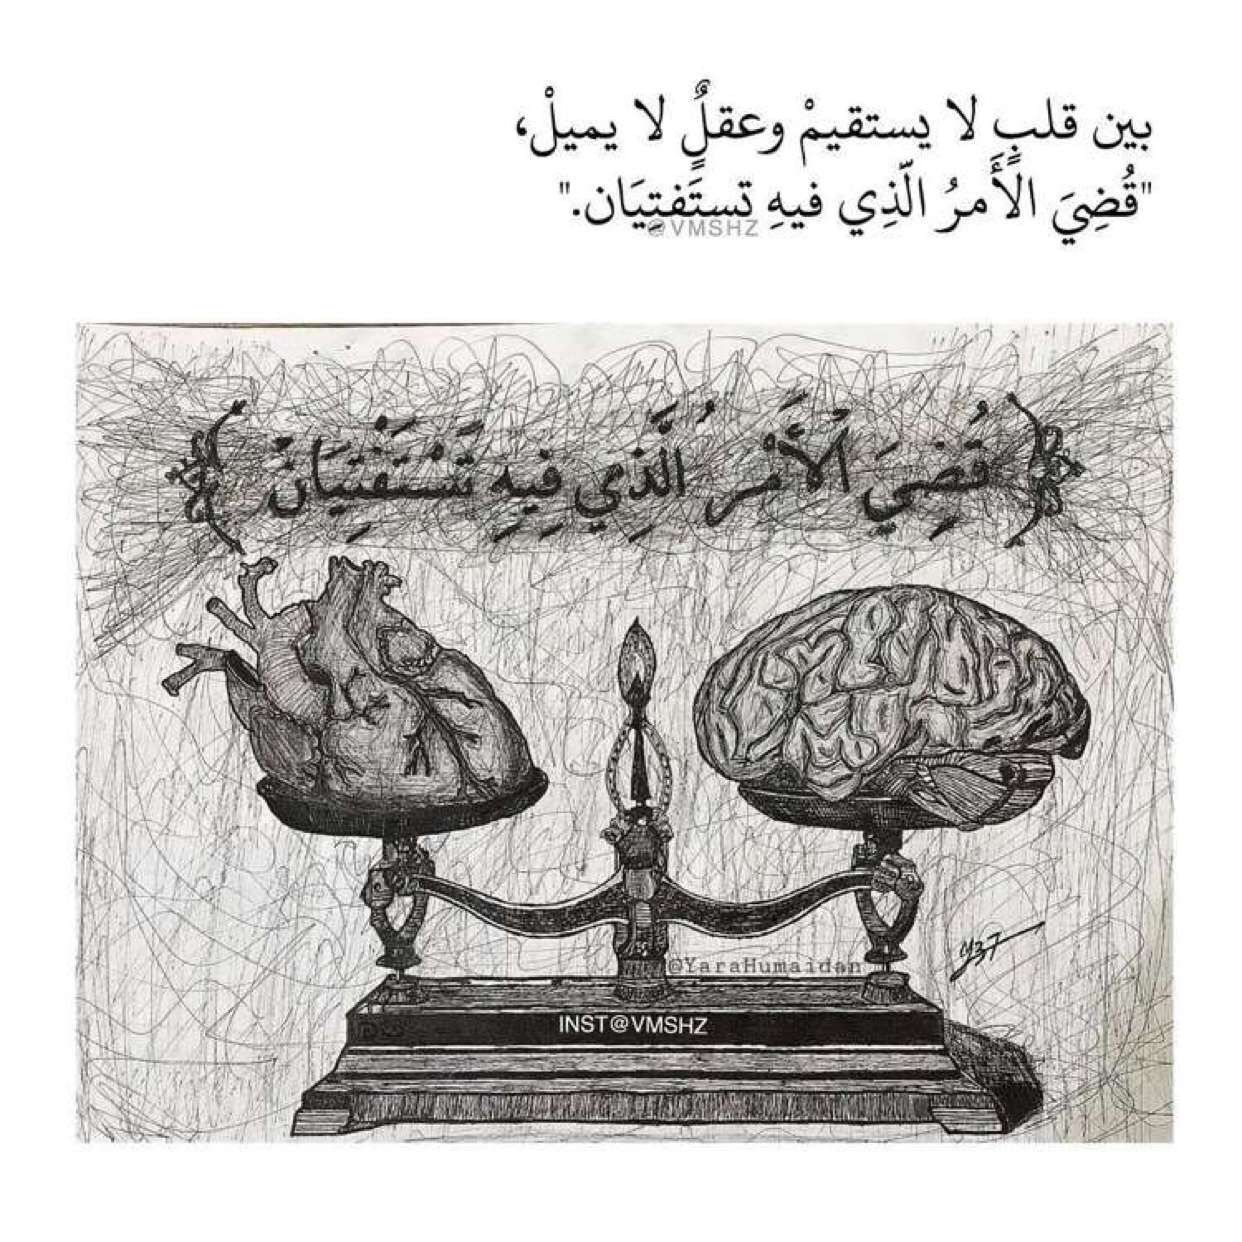 Pin By بائعة الورد On ضاد وحروف Arabic Words Arabic Quotes Vintage World Maps